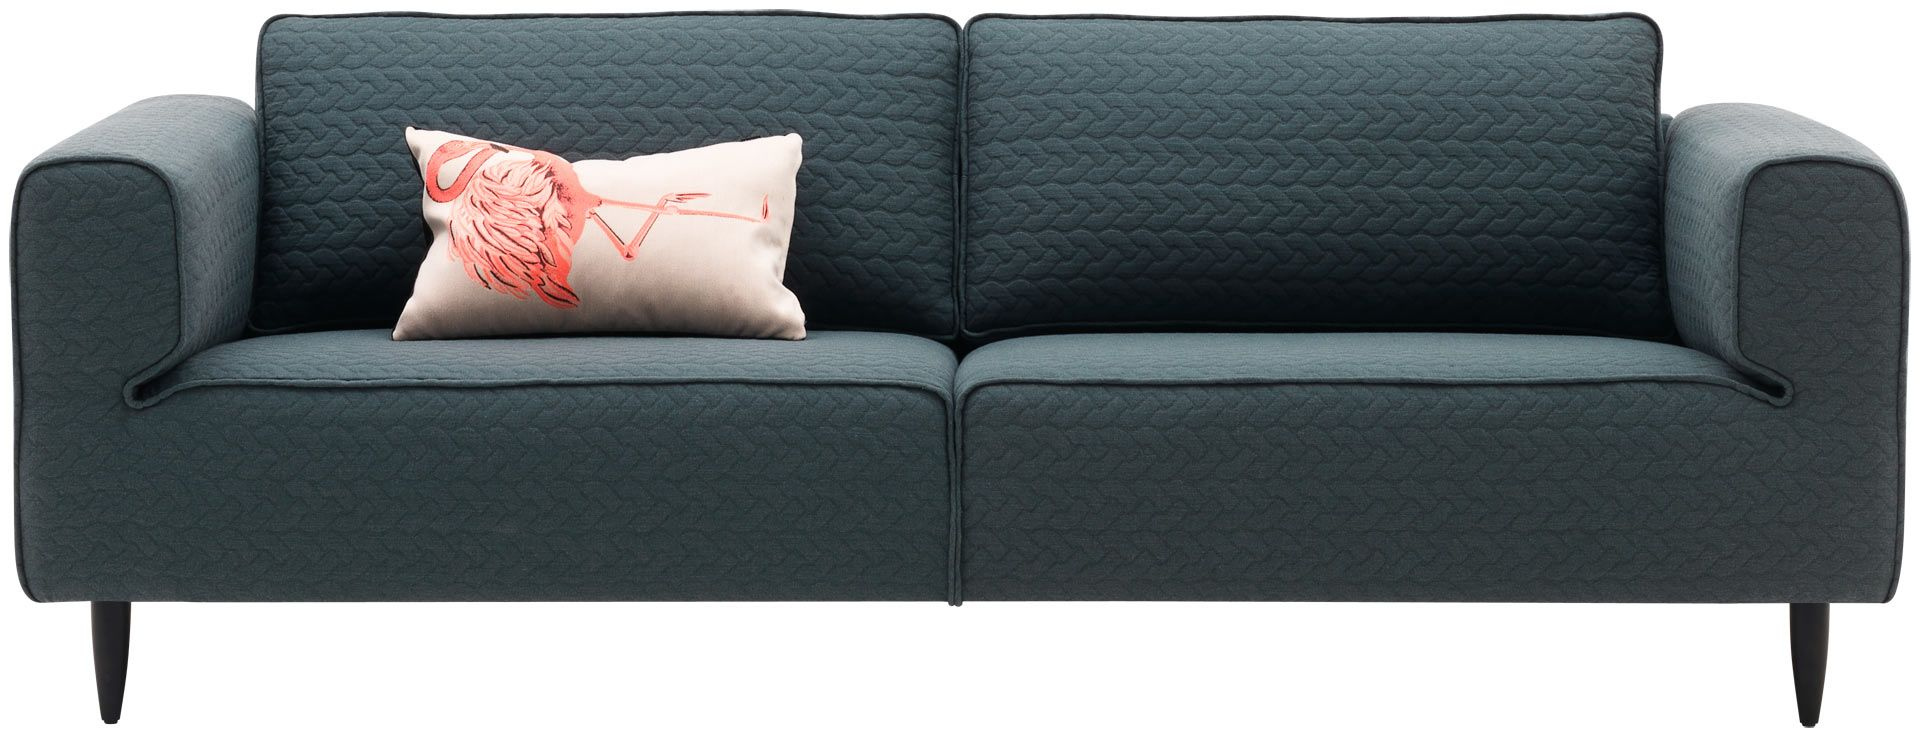 Canape Bo Concept Modern Sofa Designs Contemporary Sofa Design Green Fabric Sofa